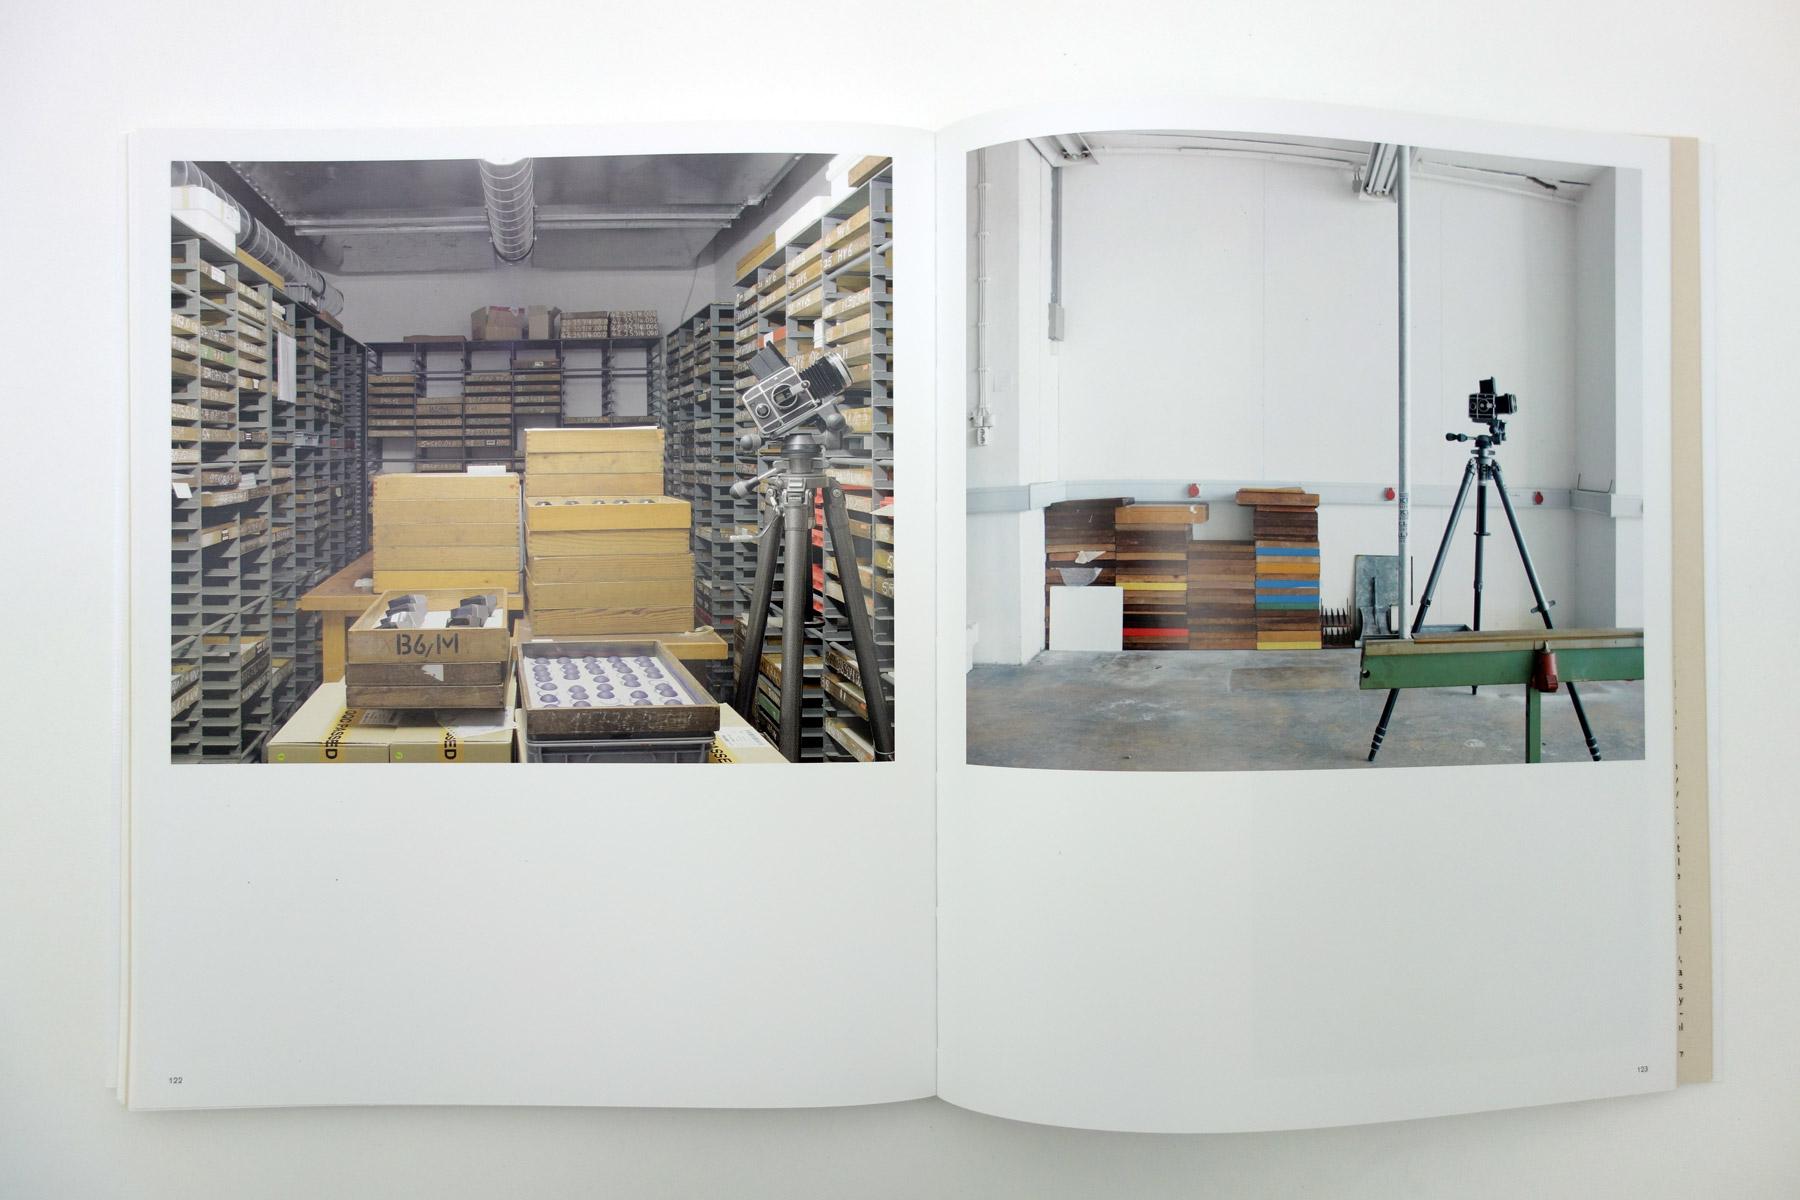 Esther Shalev-Gerz, MCBA Lausanne